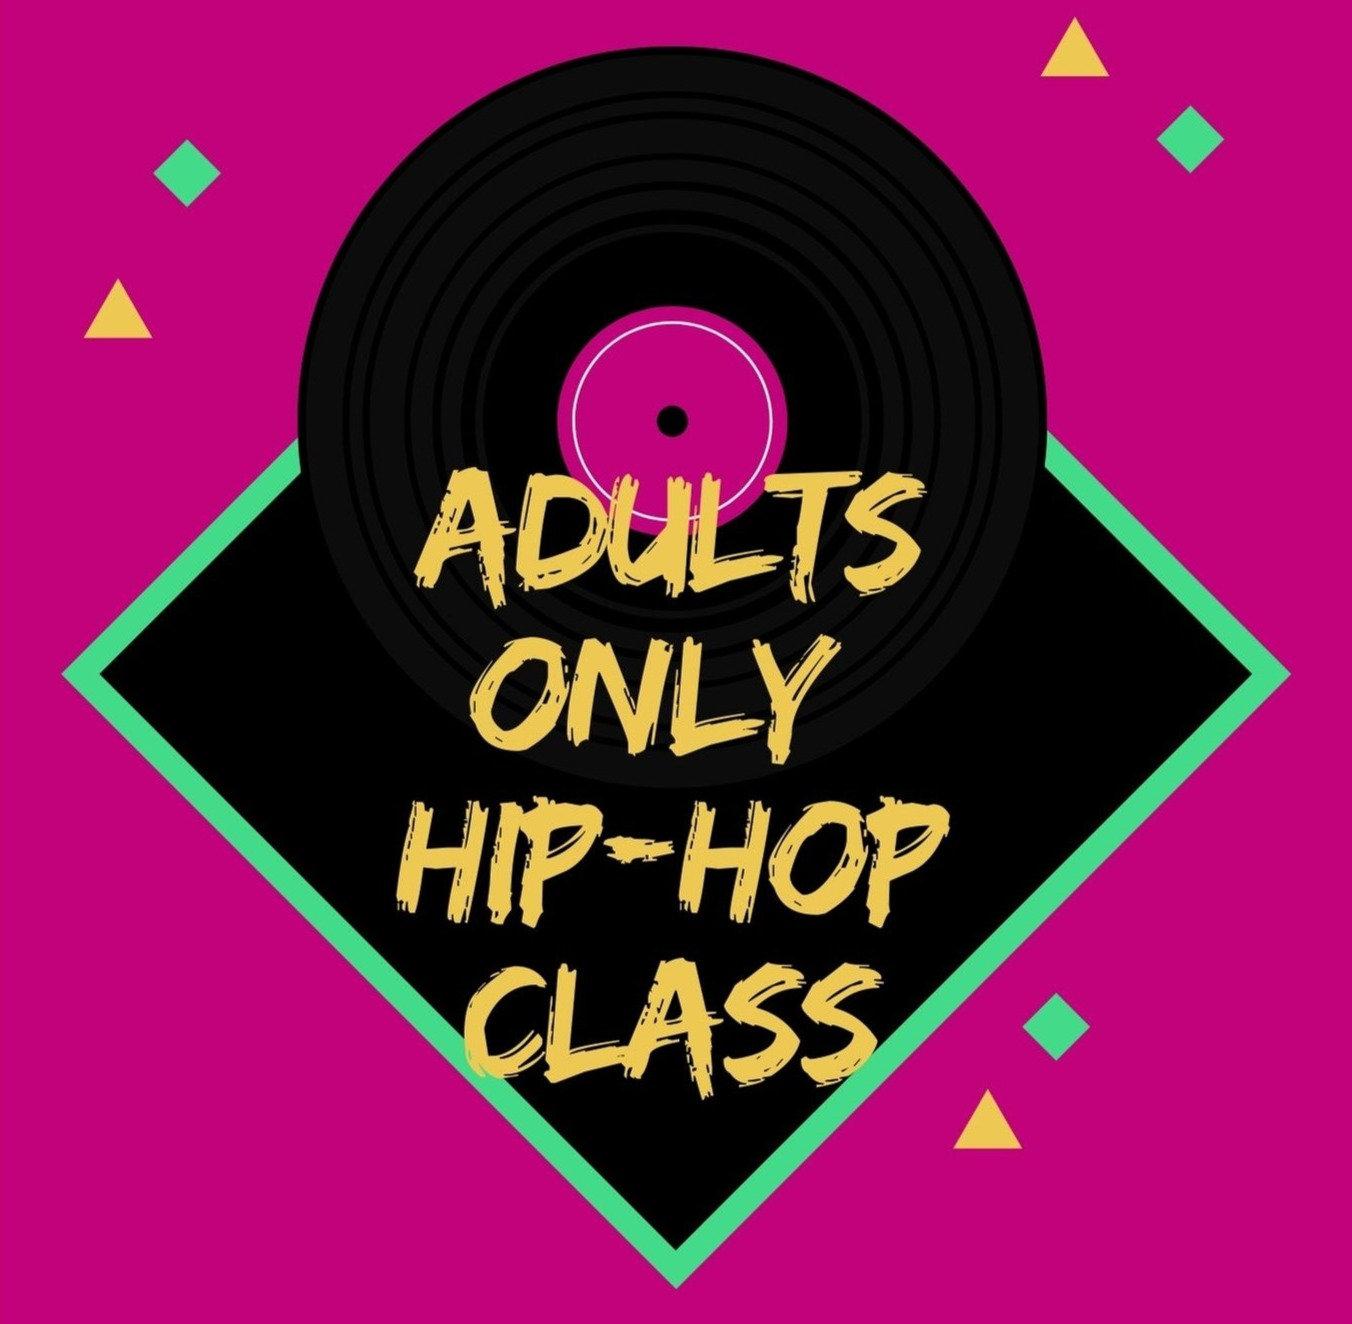 Adults Only Hip Hop Class